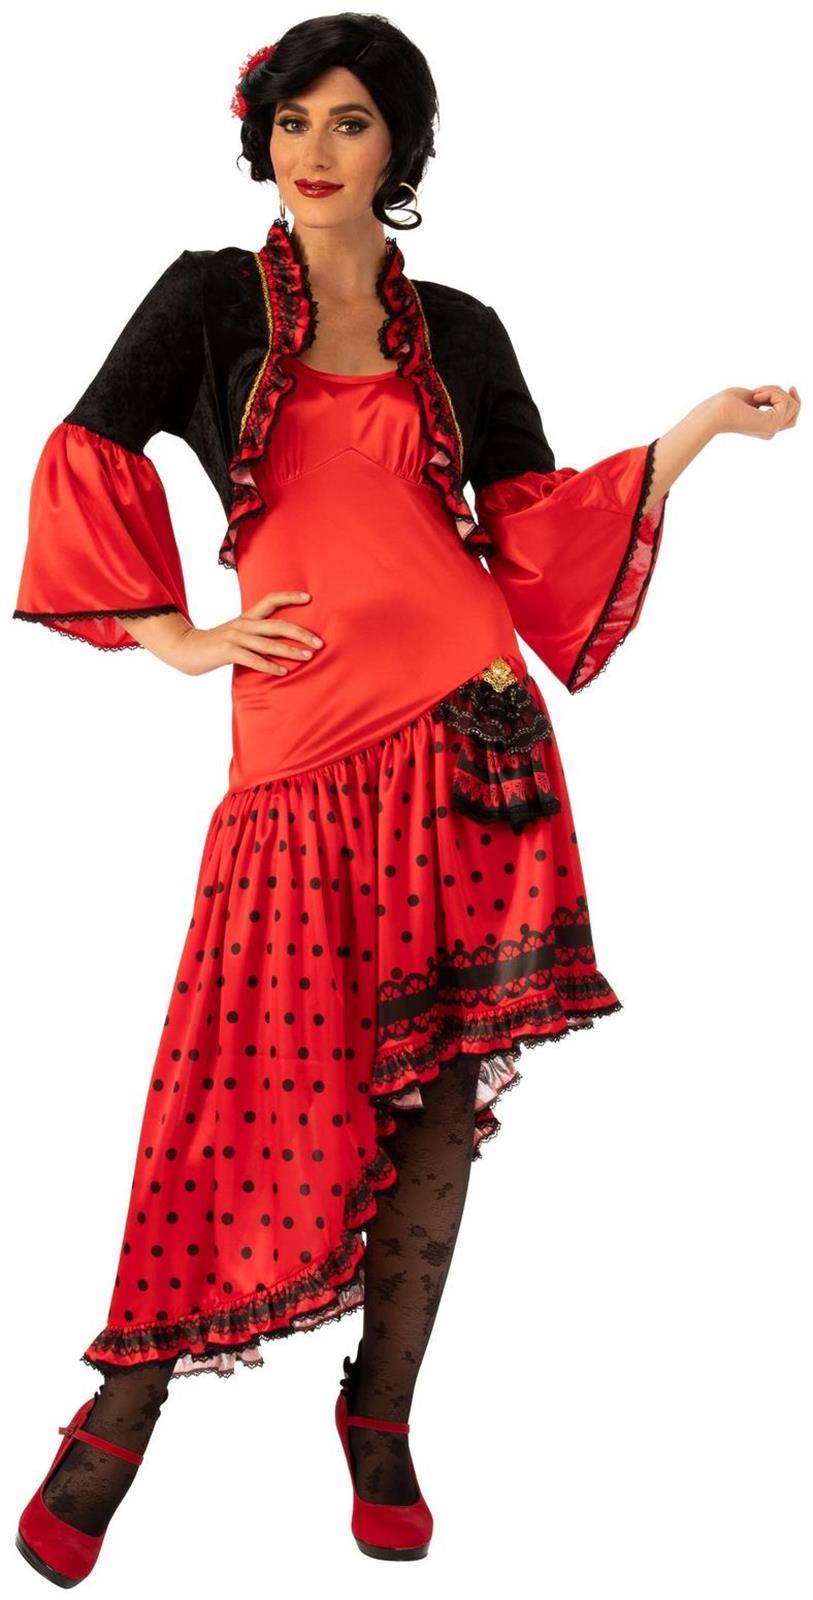 Spanish Dancer Adult Costume Dancer costume, Spanish